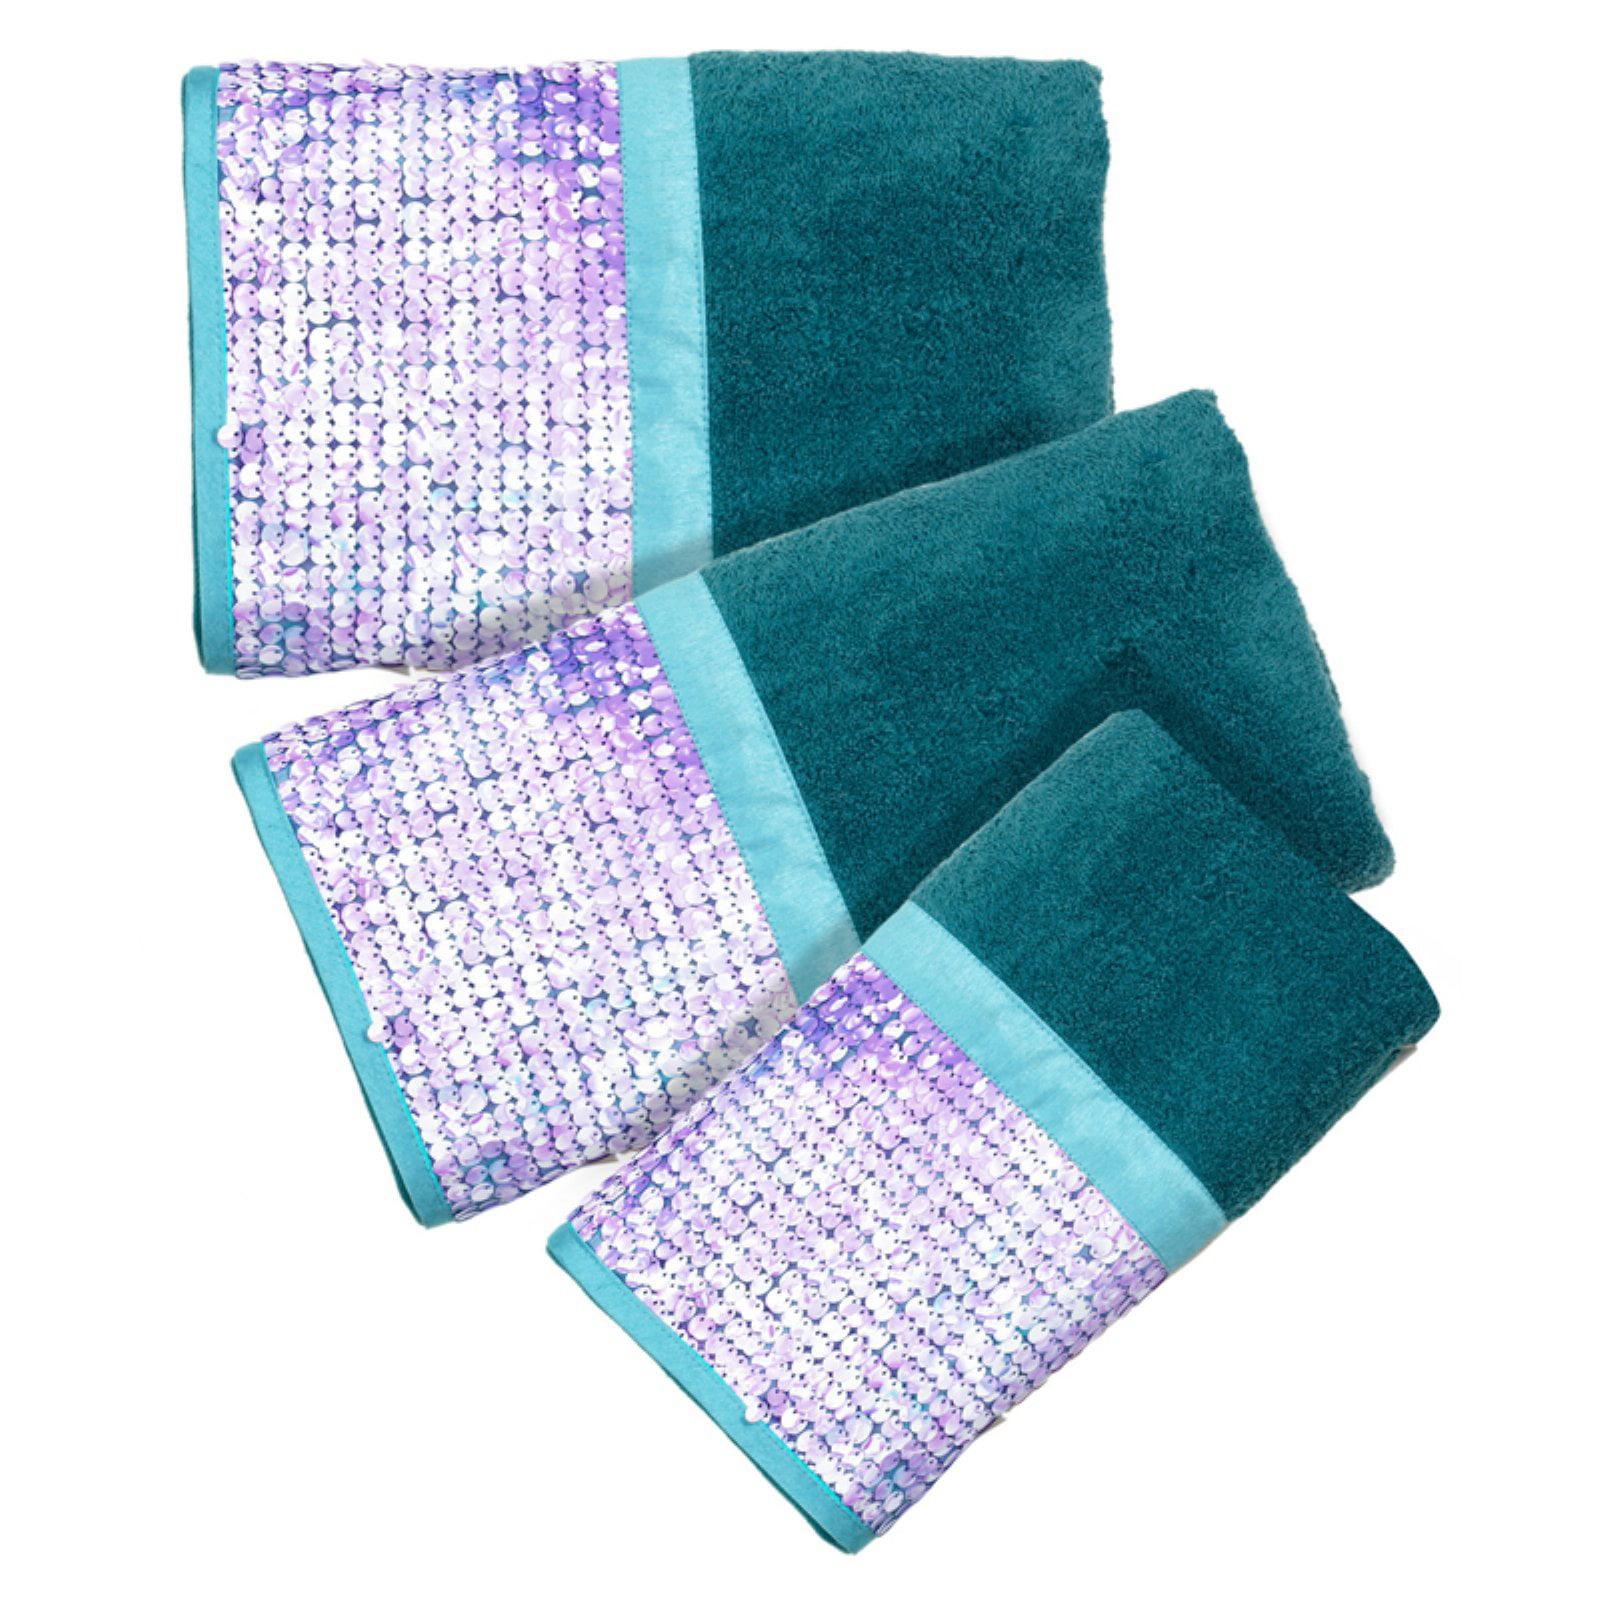 Sweet Home Collection Tammi Aqua 3 Piece Bath Towel Set by Popular Bath Products